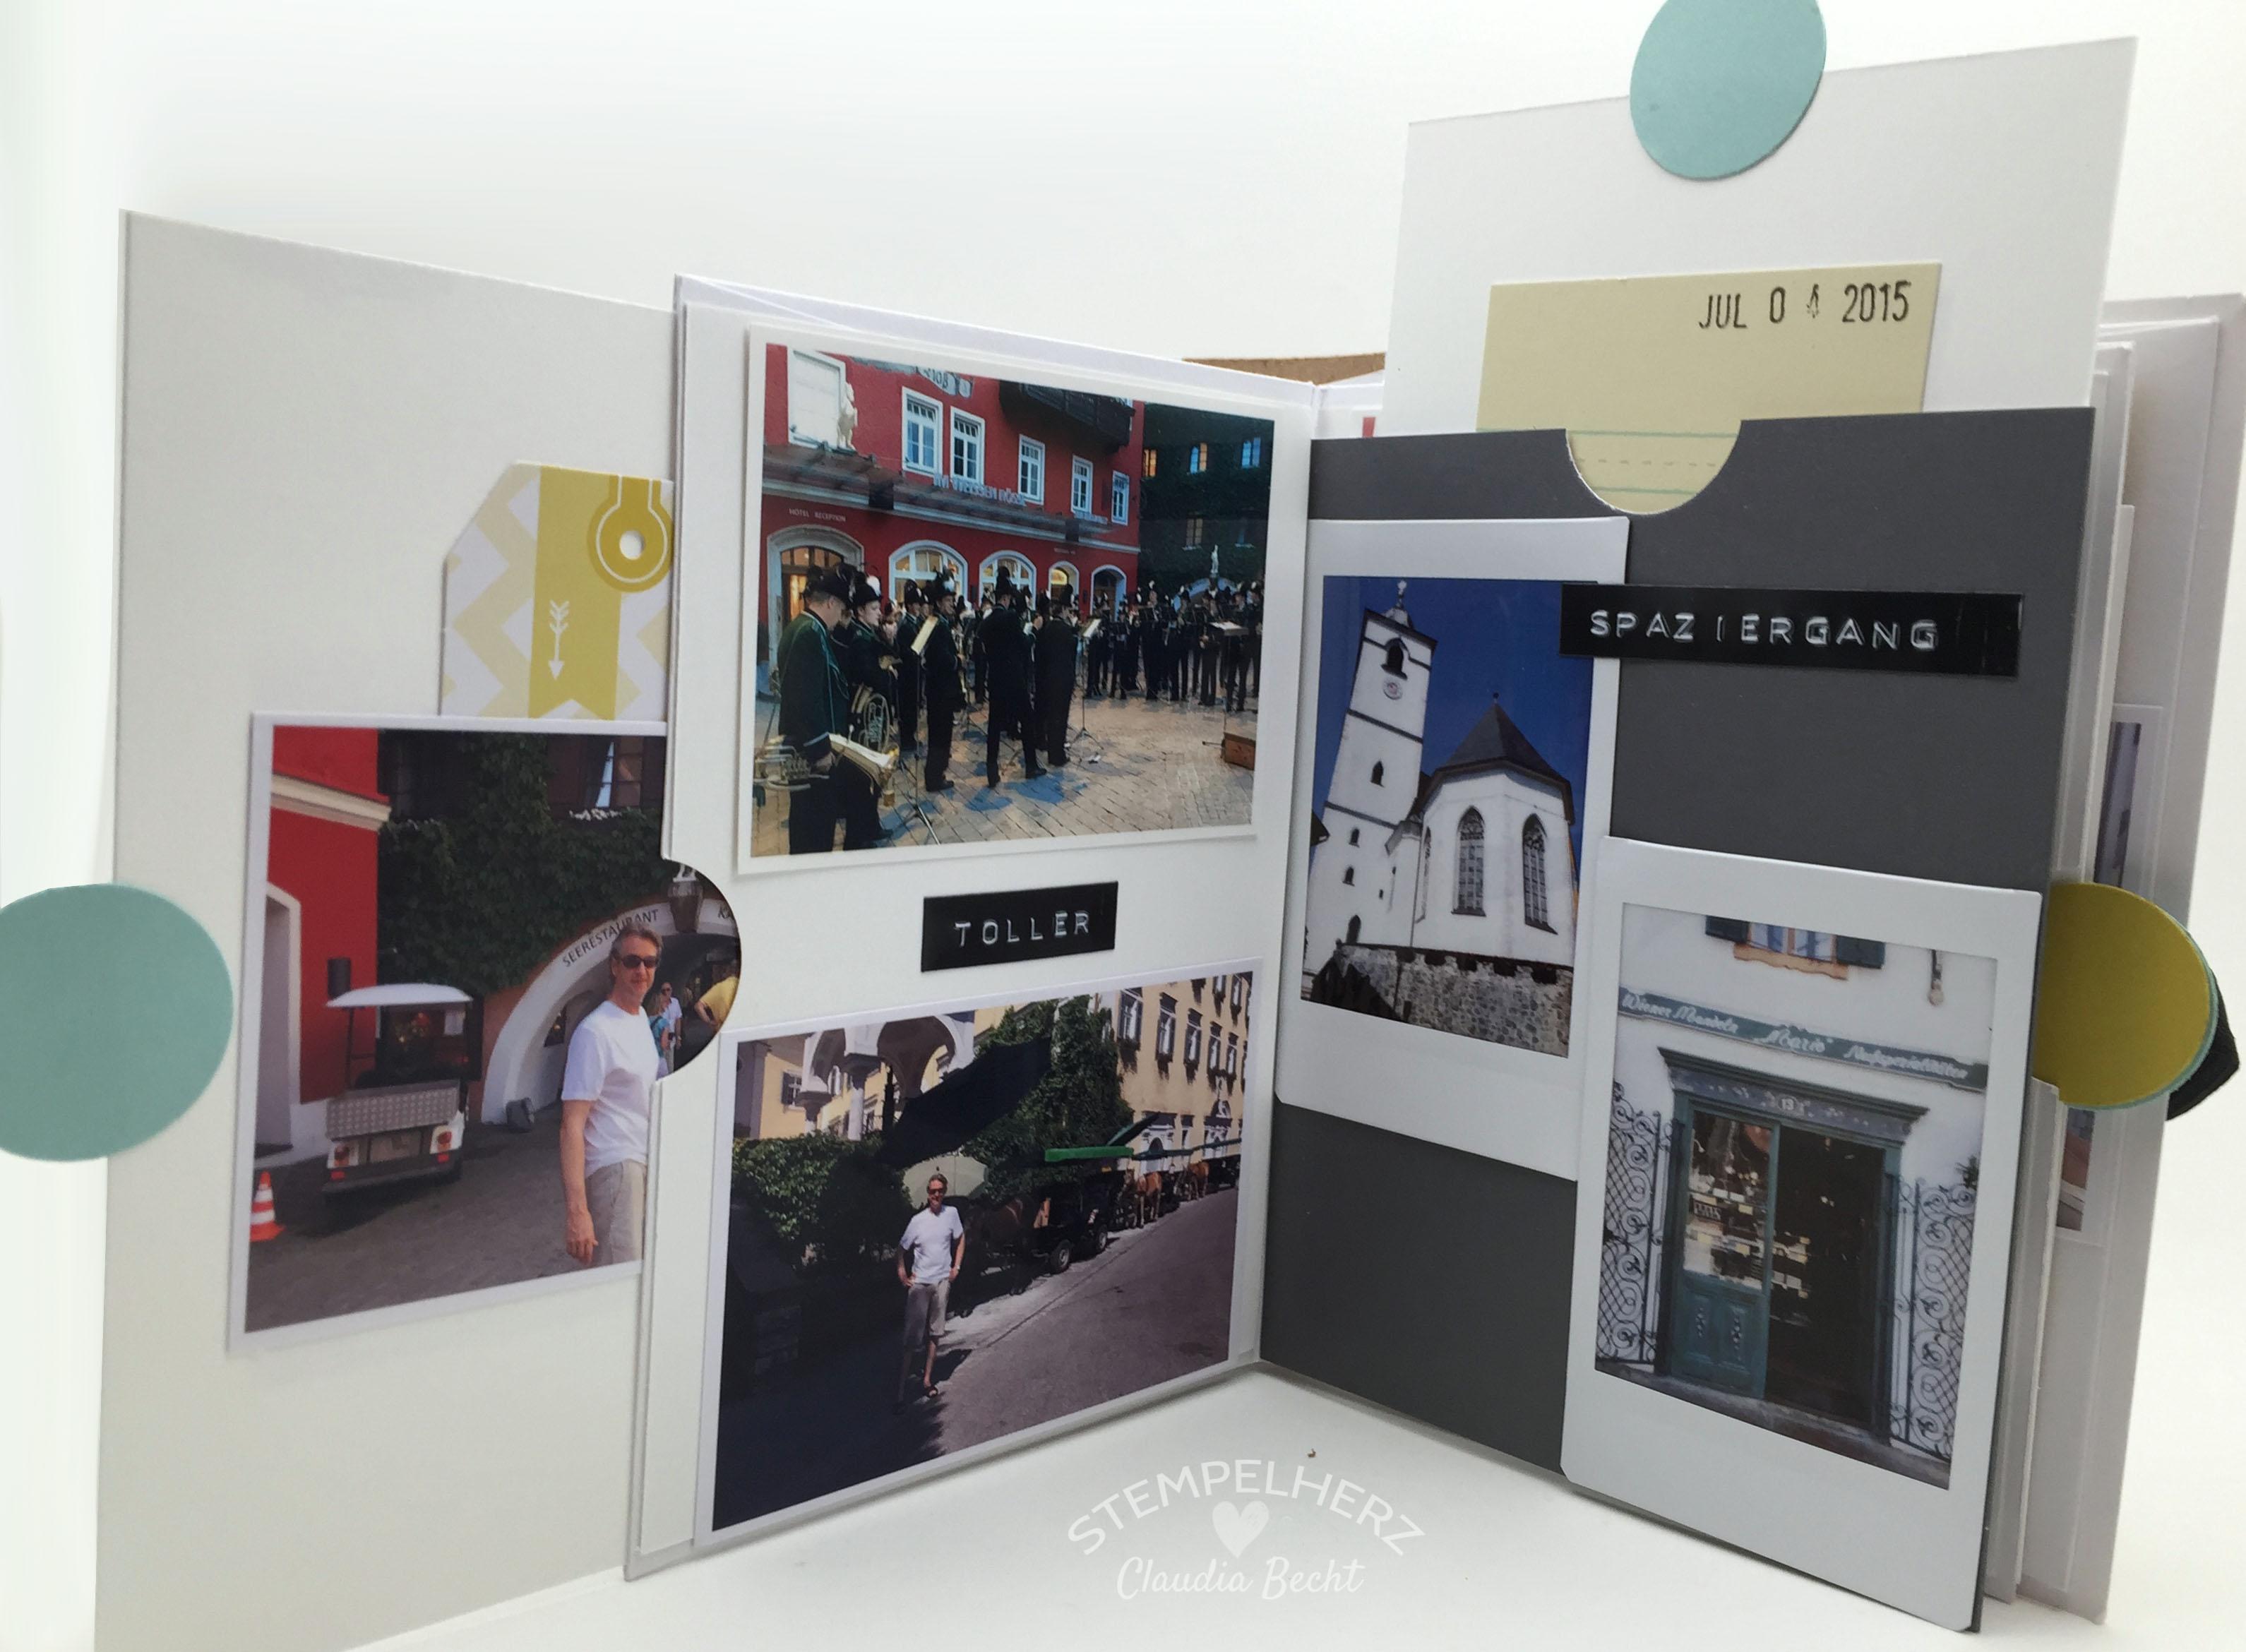 Stampin Up-Stempelherz-Album-Minibook-Minialbum Wolfgangsee 17